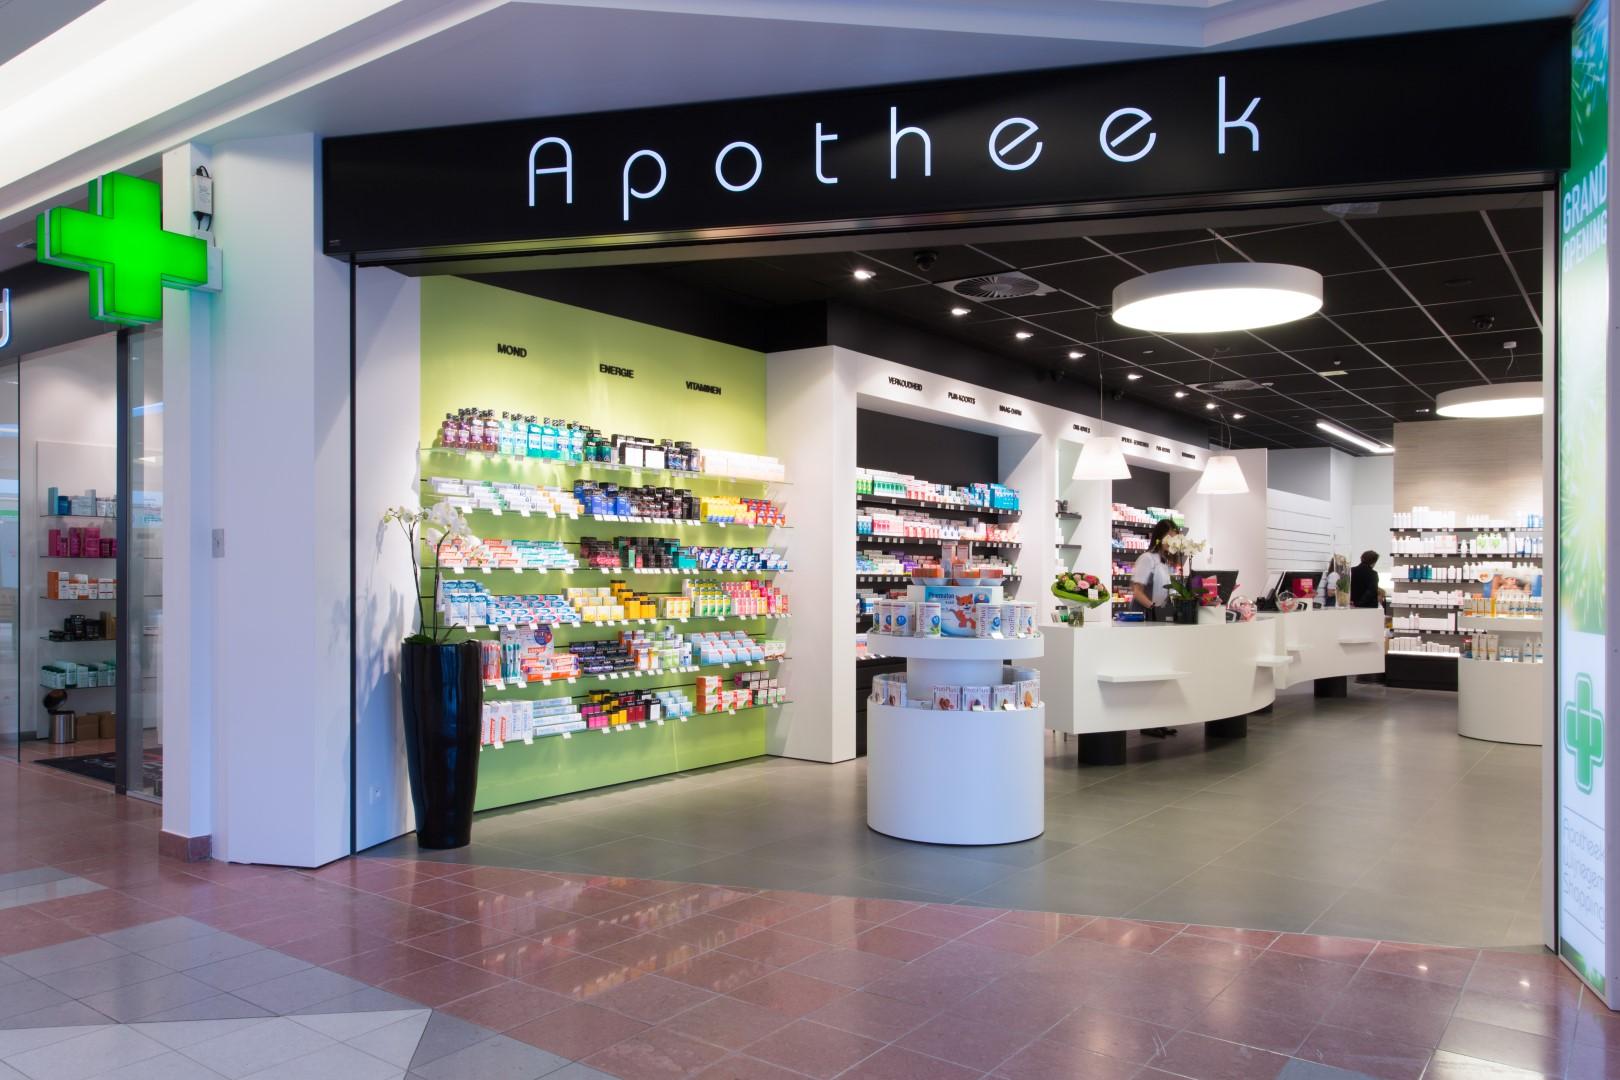 Apotheek Wijnegem Shopping Center Arspharma